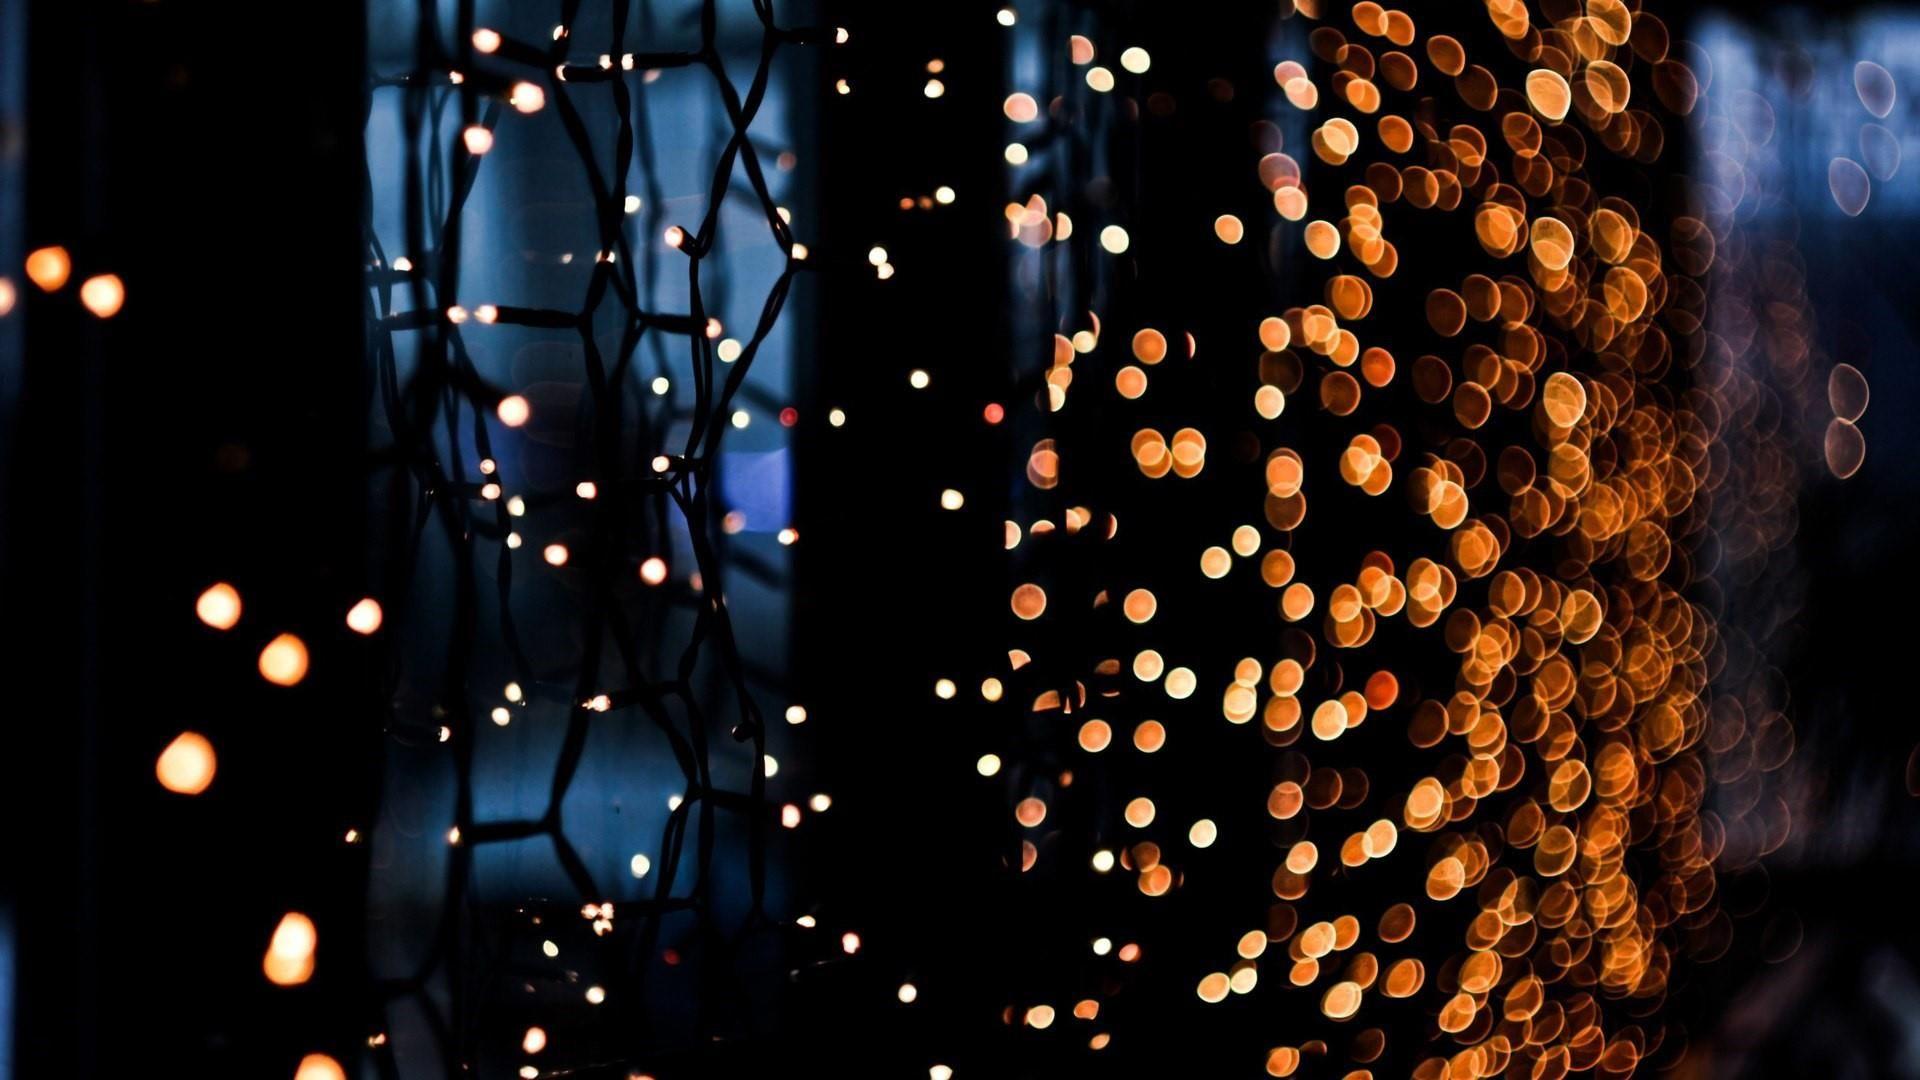 Pin by vassik on Lights & Fire Christmas lights